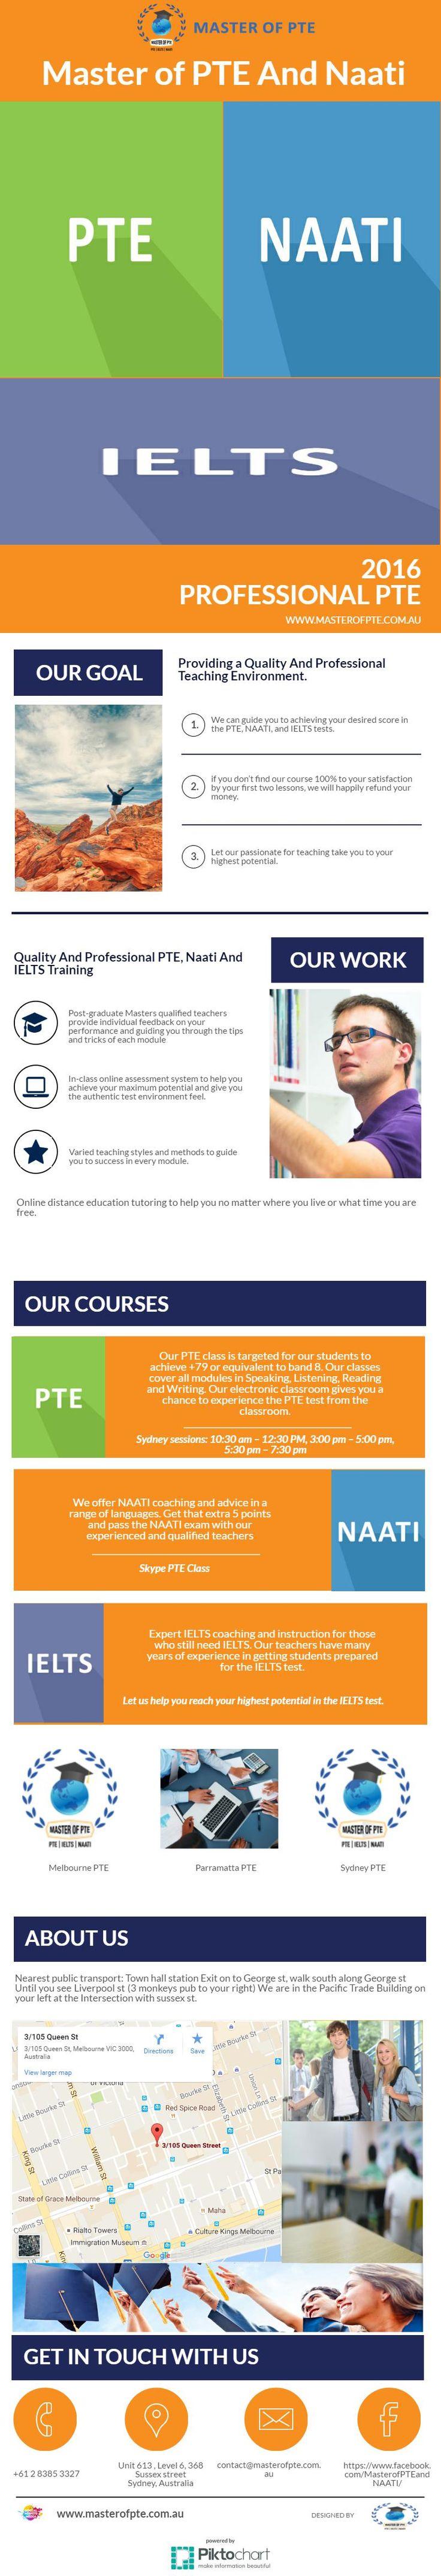 Study #PTE And #Naati